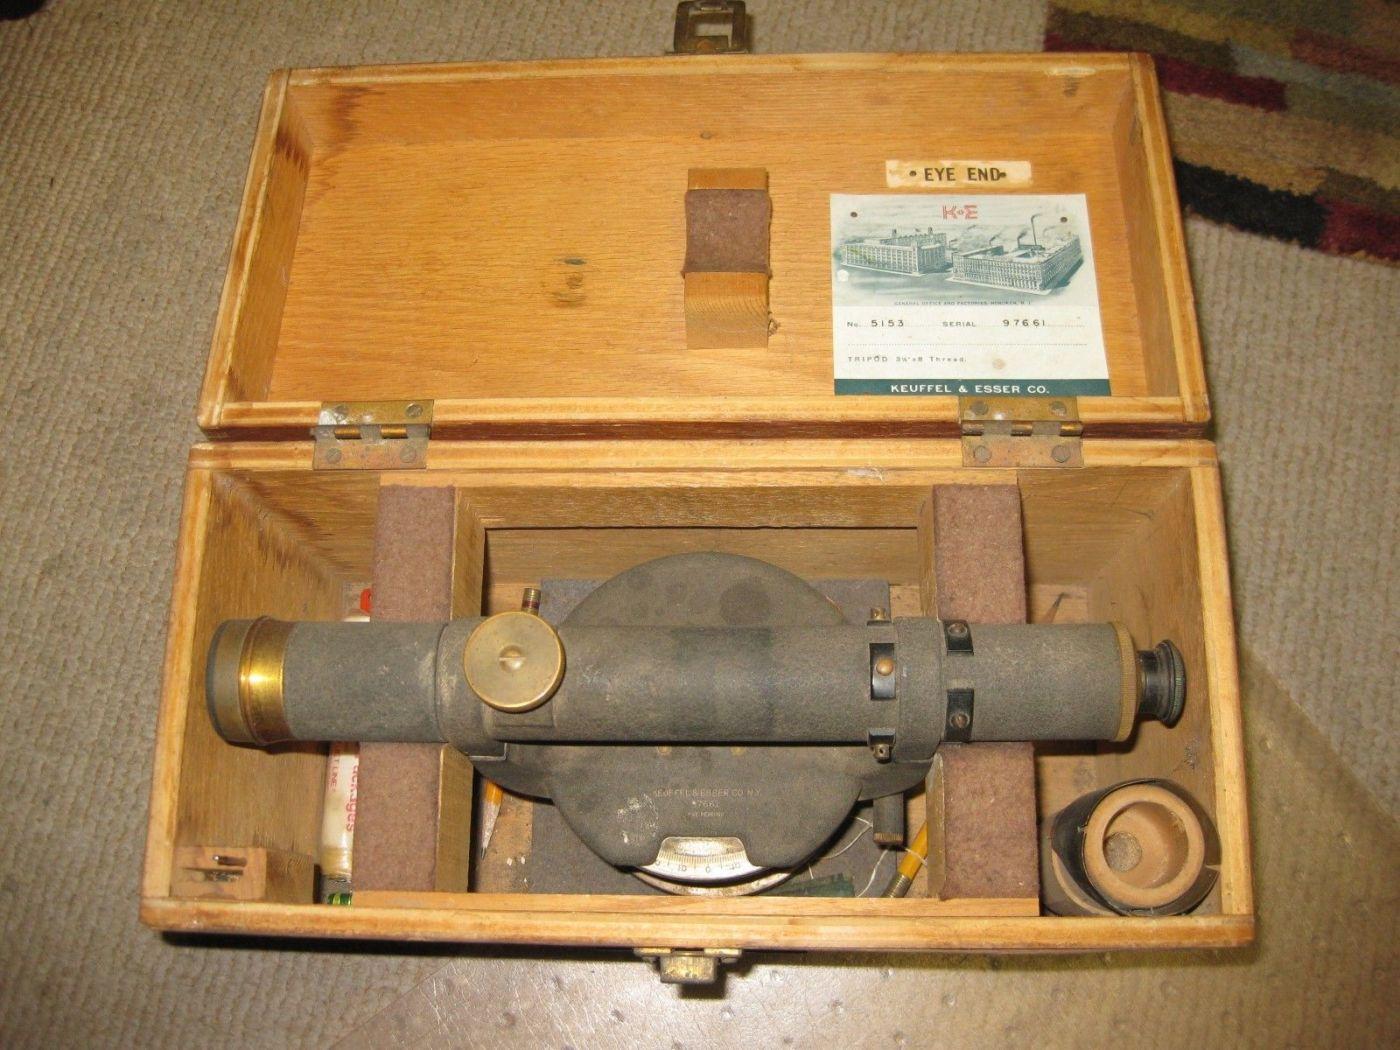 VTG Keuffel Esser Surveying Transit Level 1940s